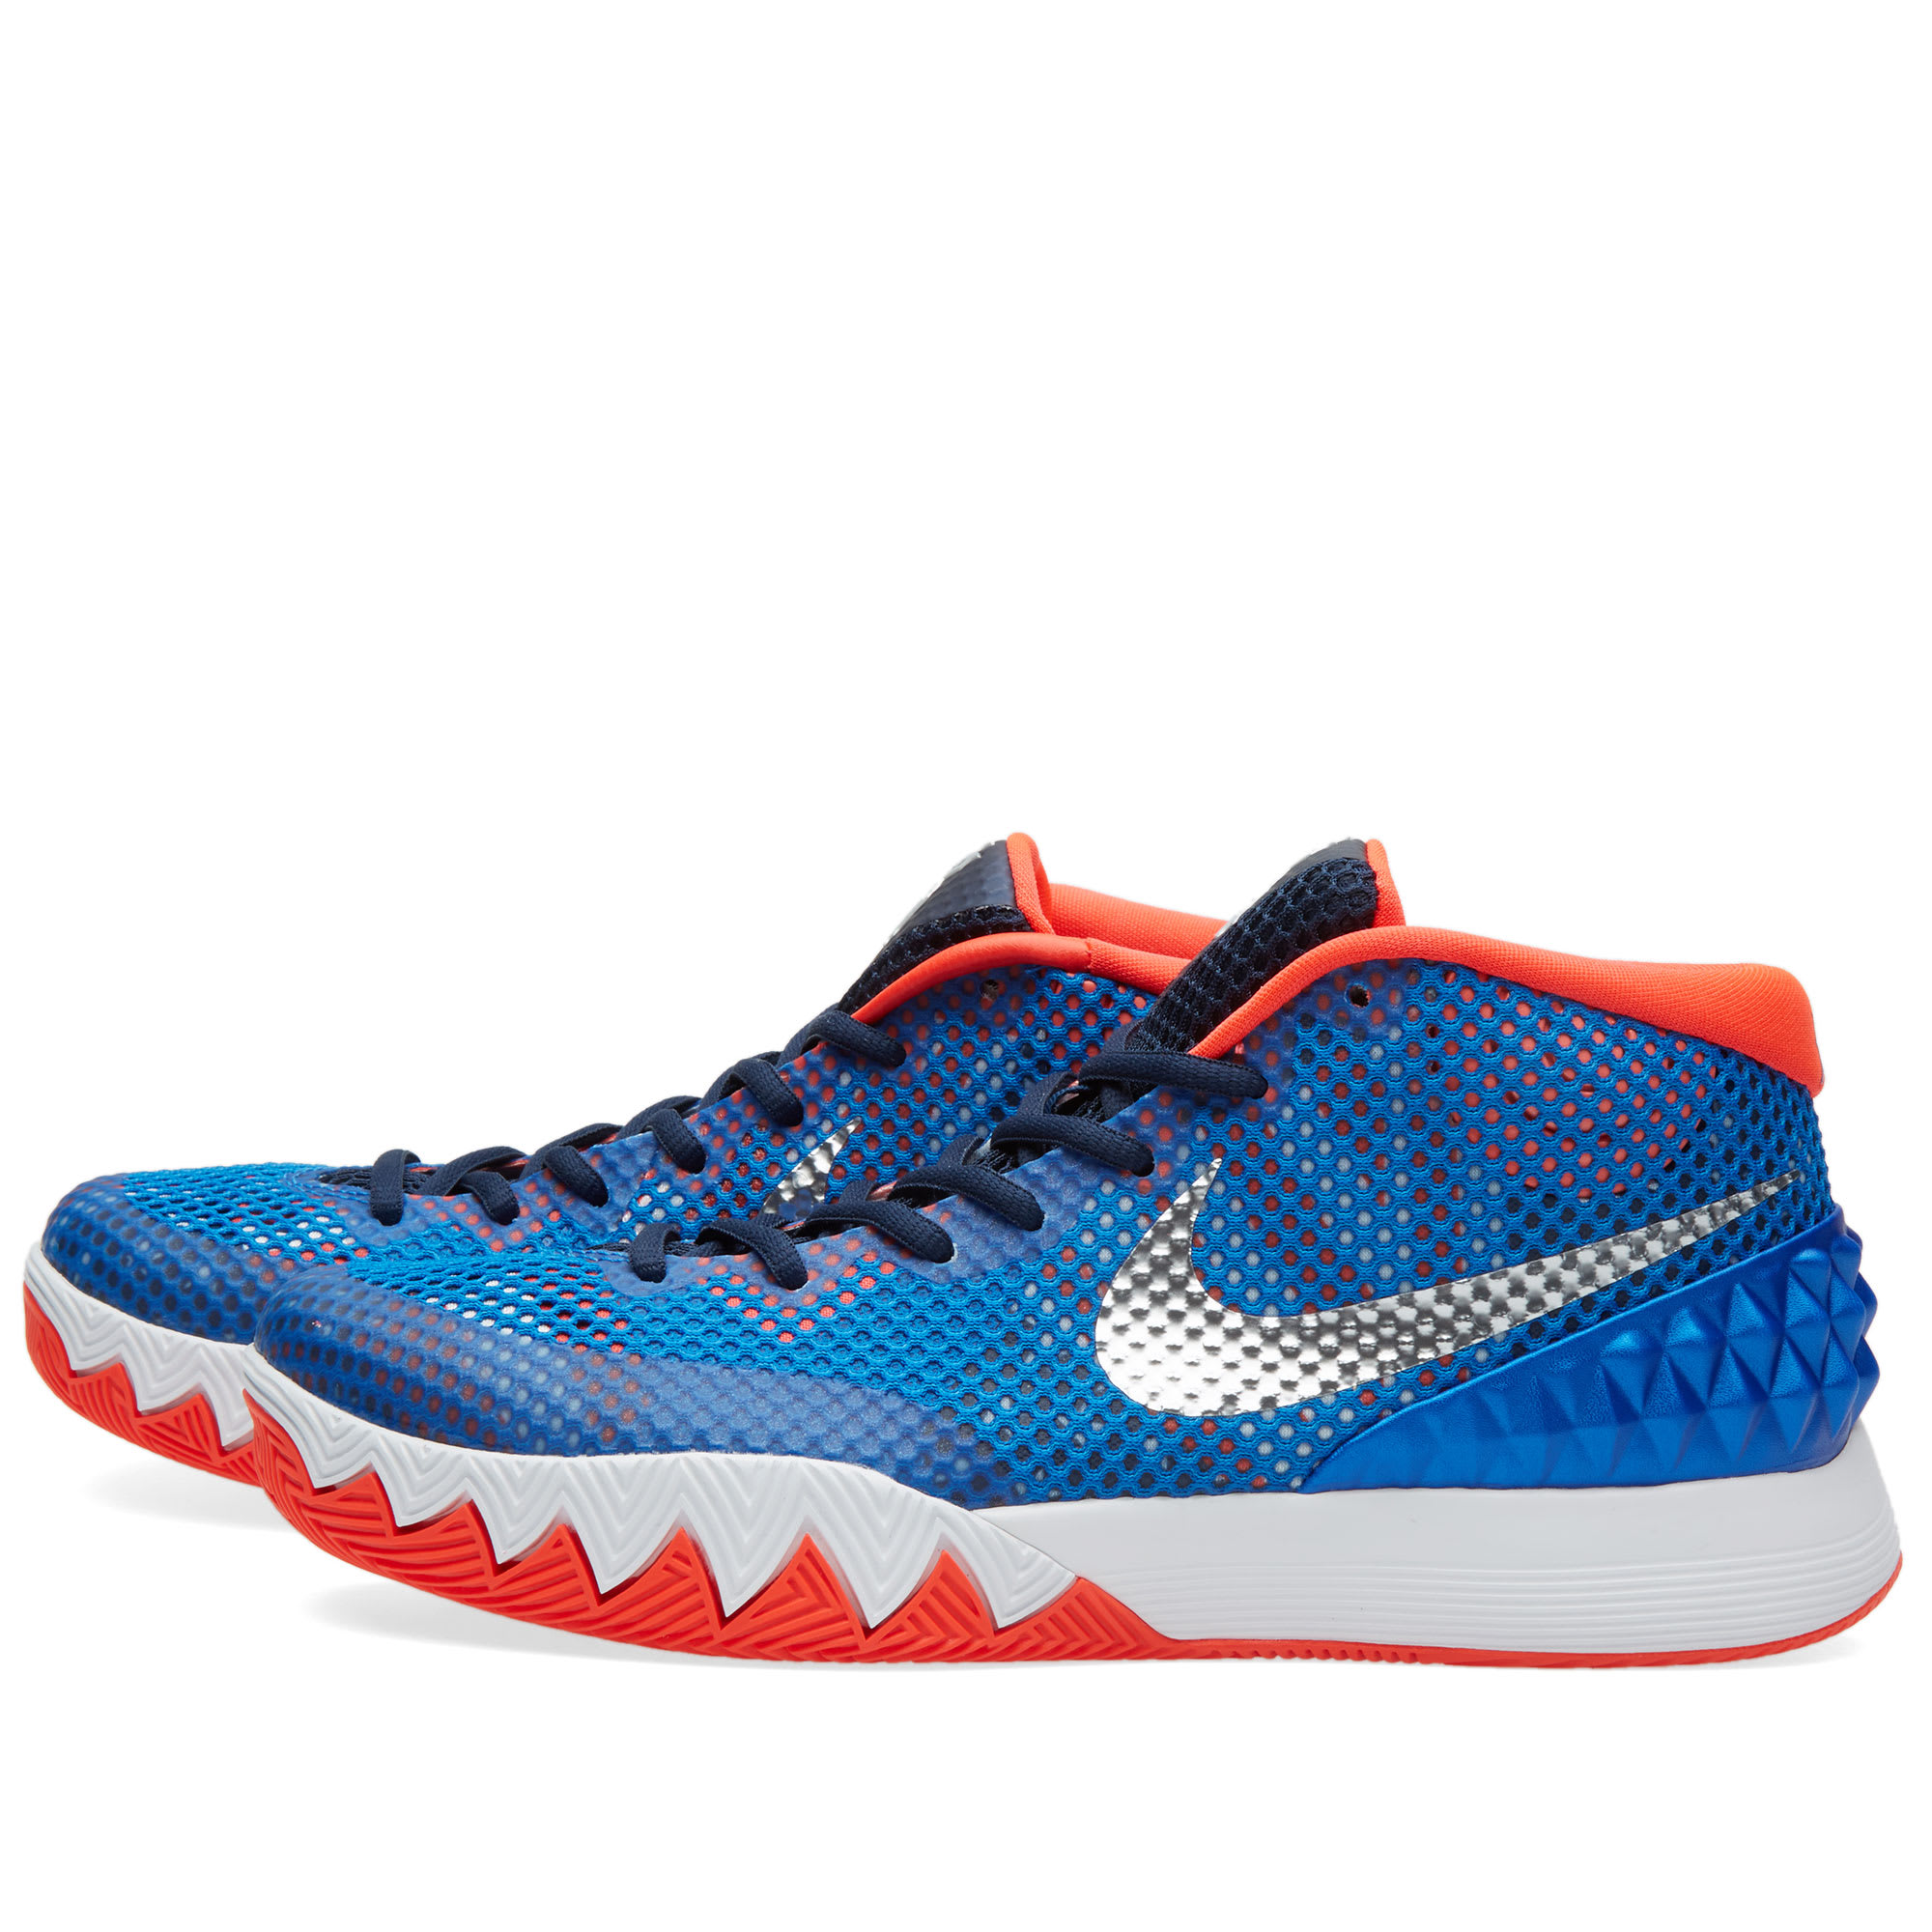 Nike Kyrie 1 'USA' (Soar & Metallic Silver)